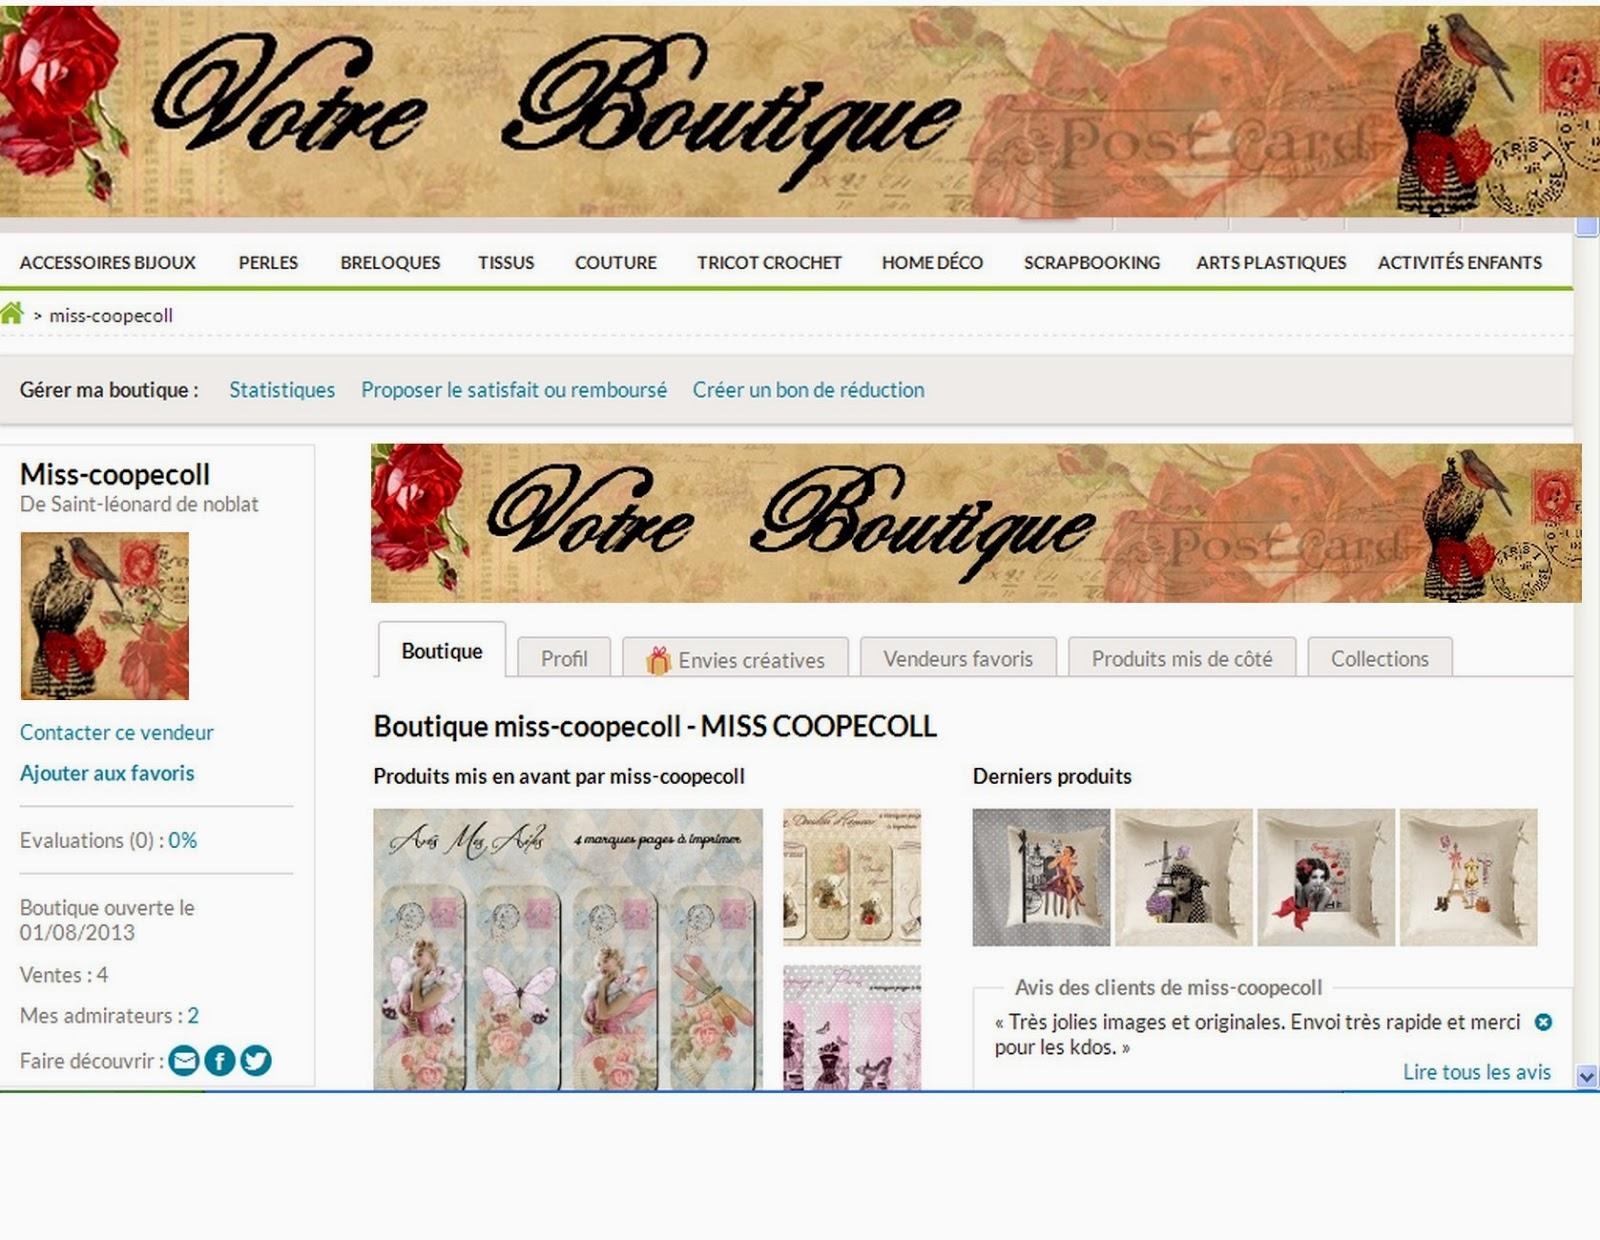 http://www.alittlemarket.com/loisirs-creatifs-scrapbooking/banniere_avatar_pour_votre_boutique_alm_beautiful_birds4_-6915117.html